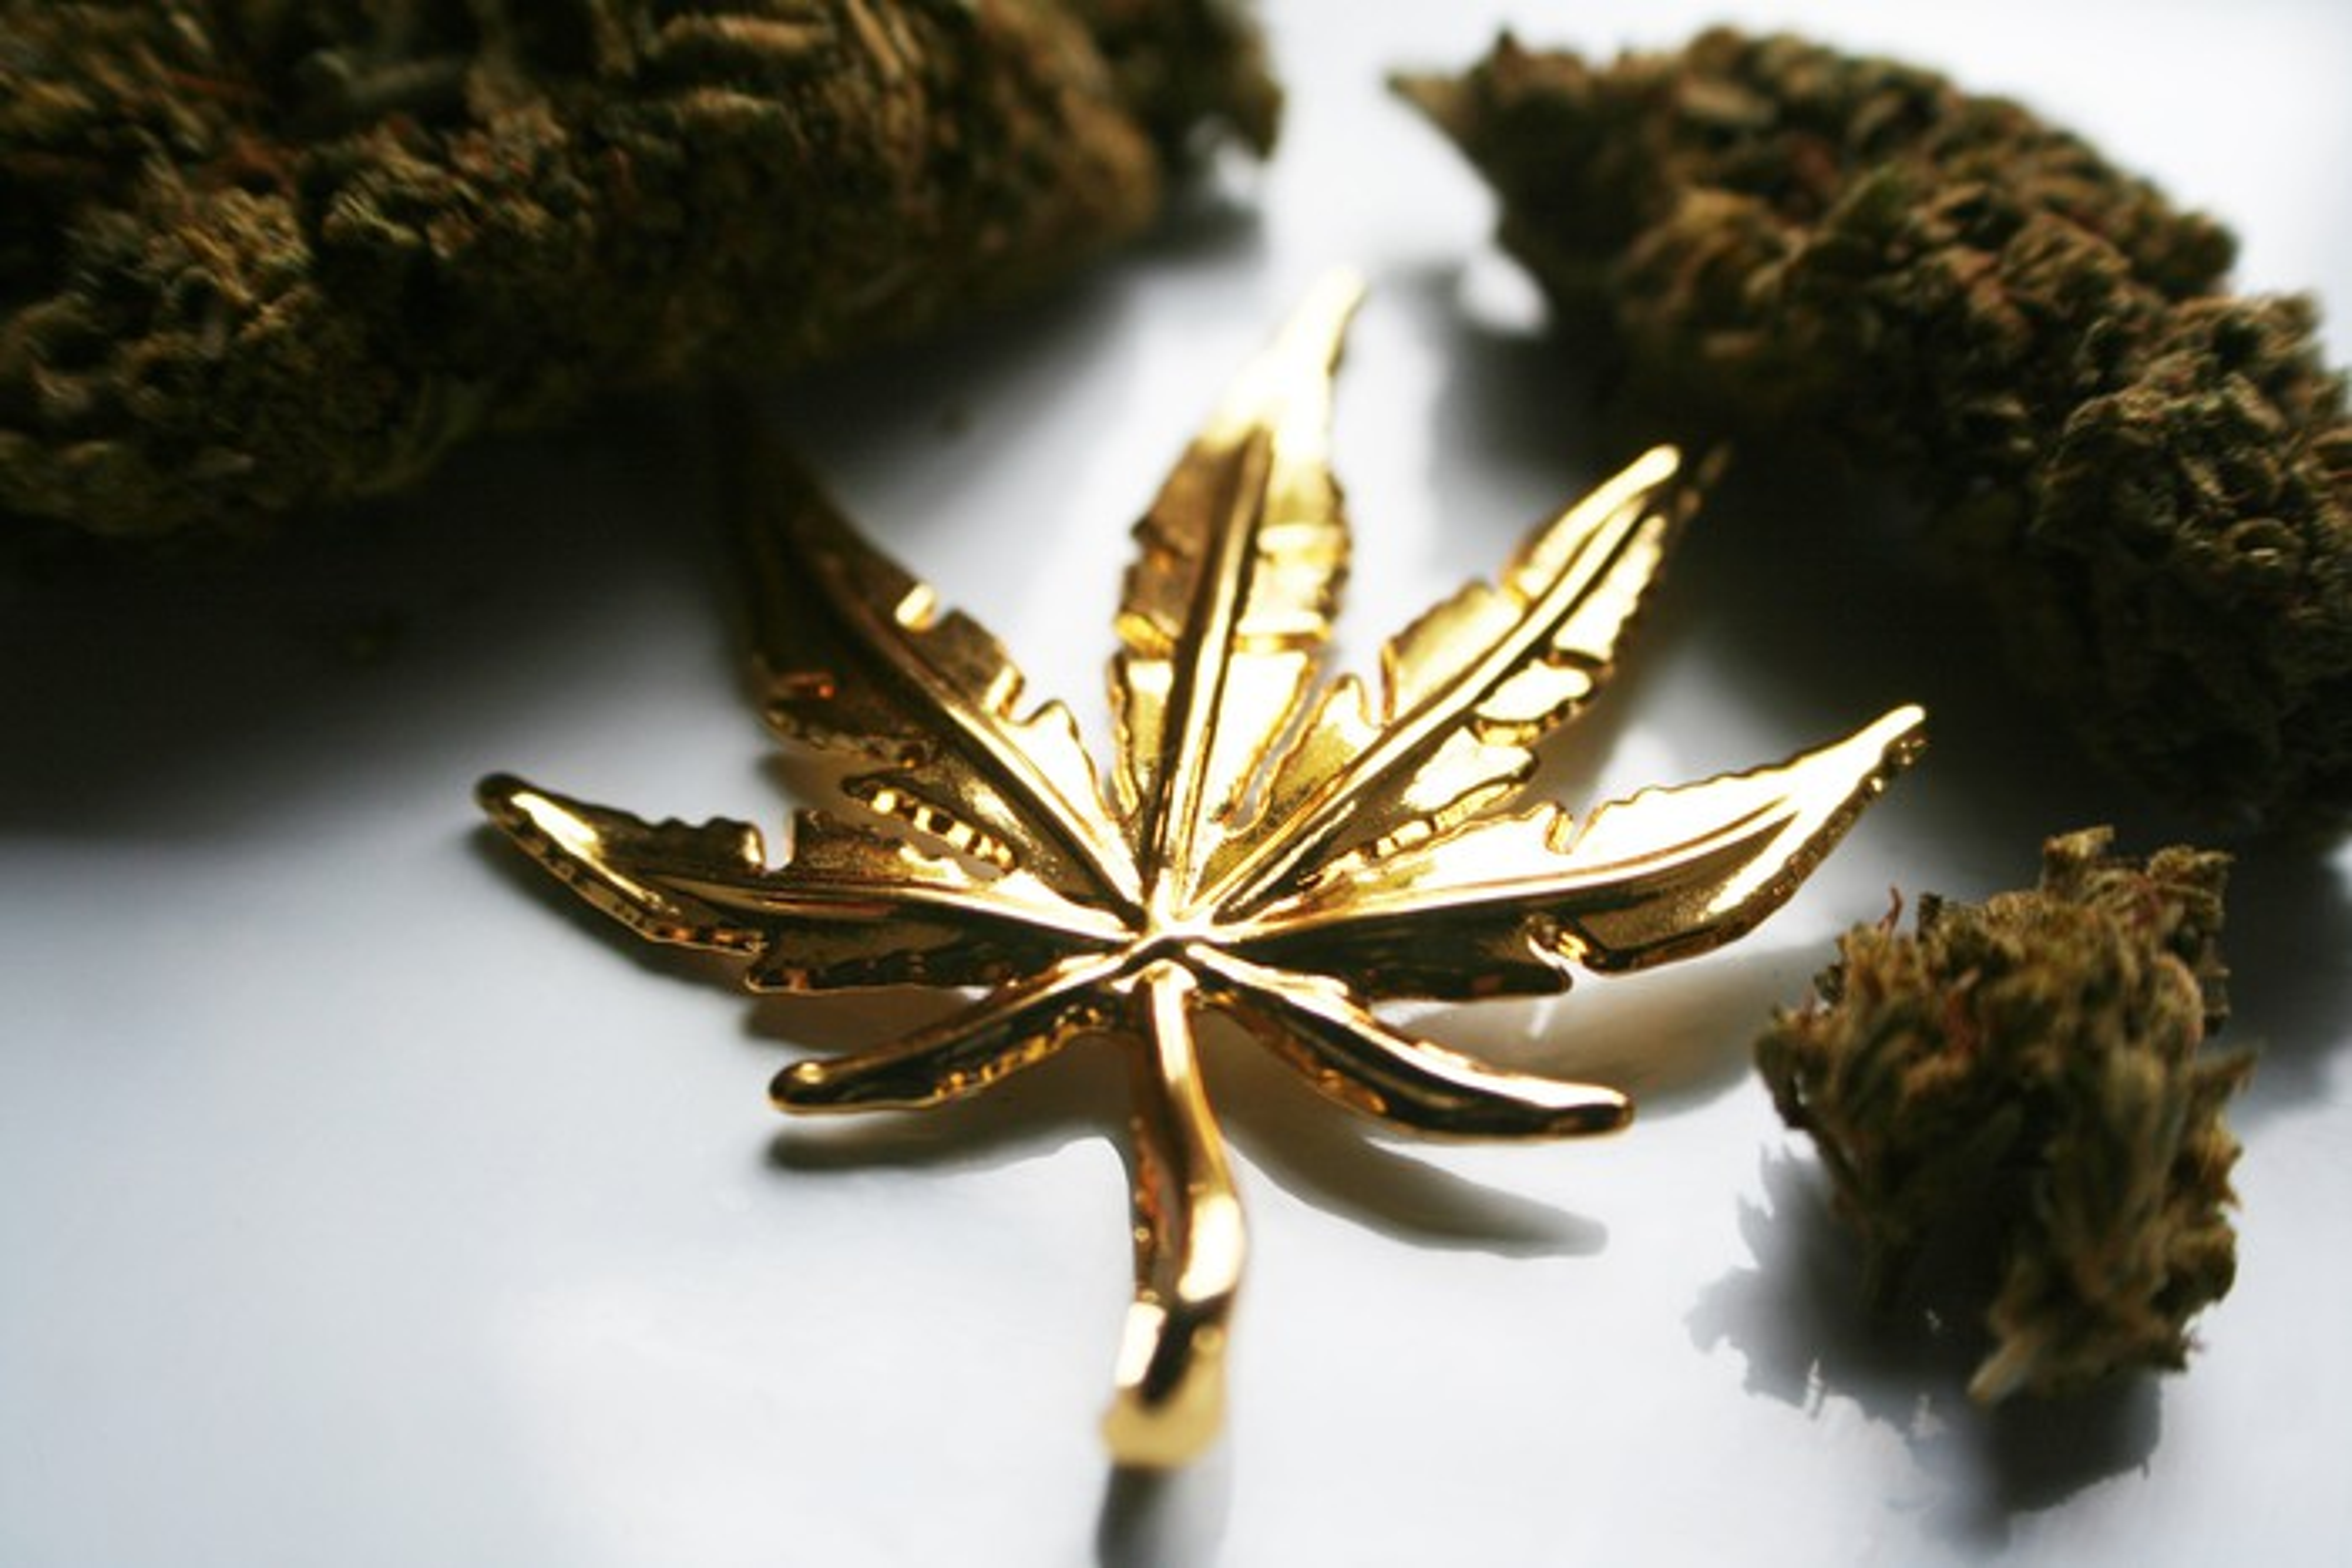 A gold marijuana leaf rests on a table next to dried marijuana buds.